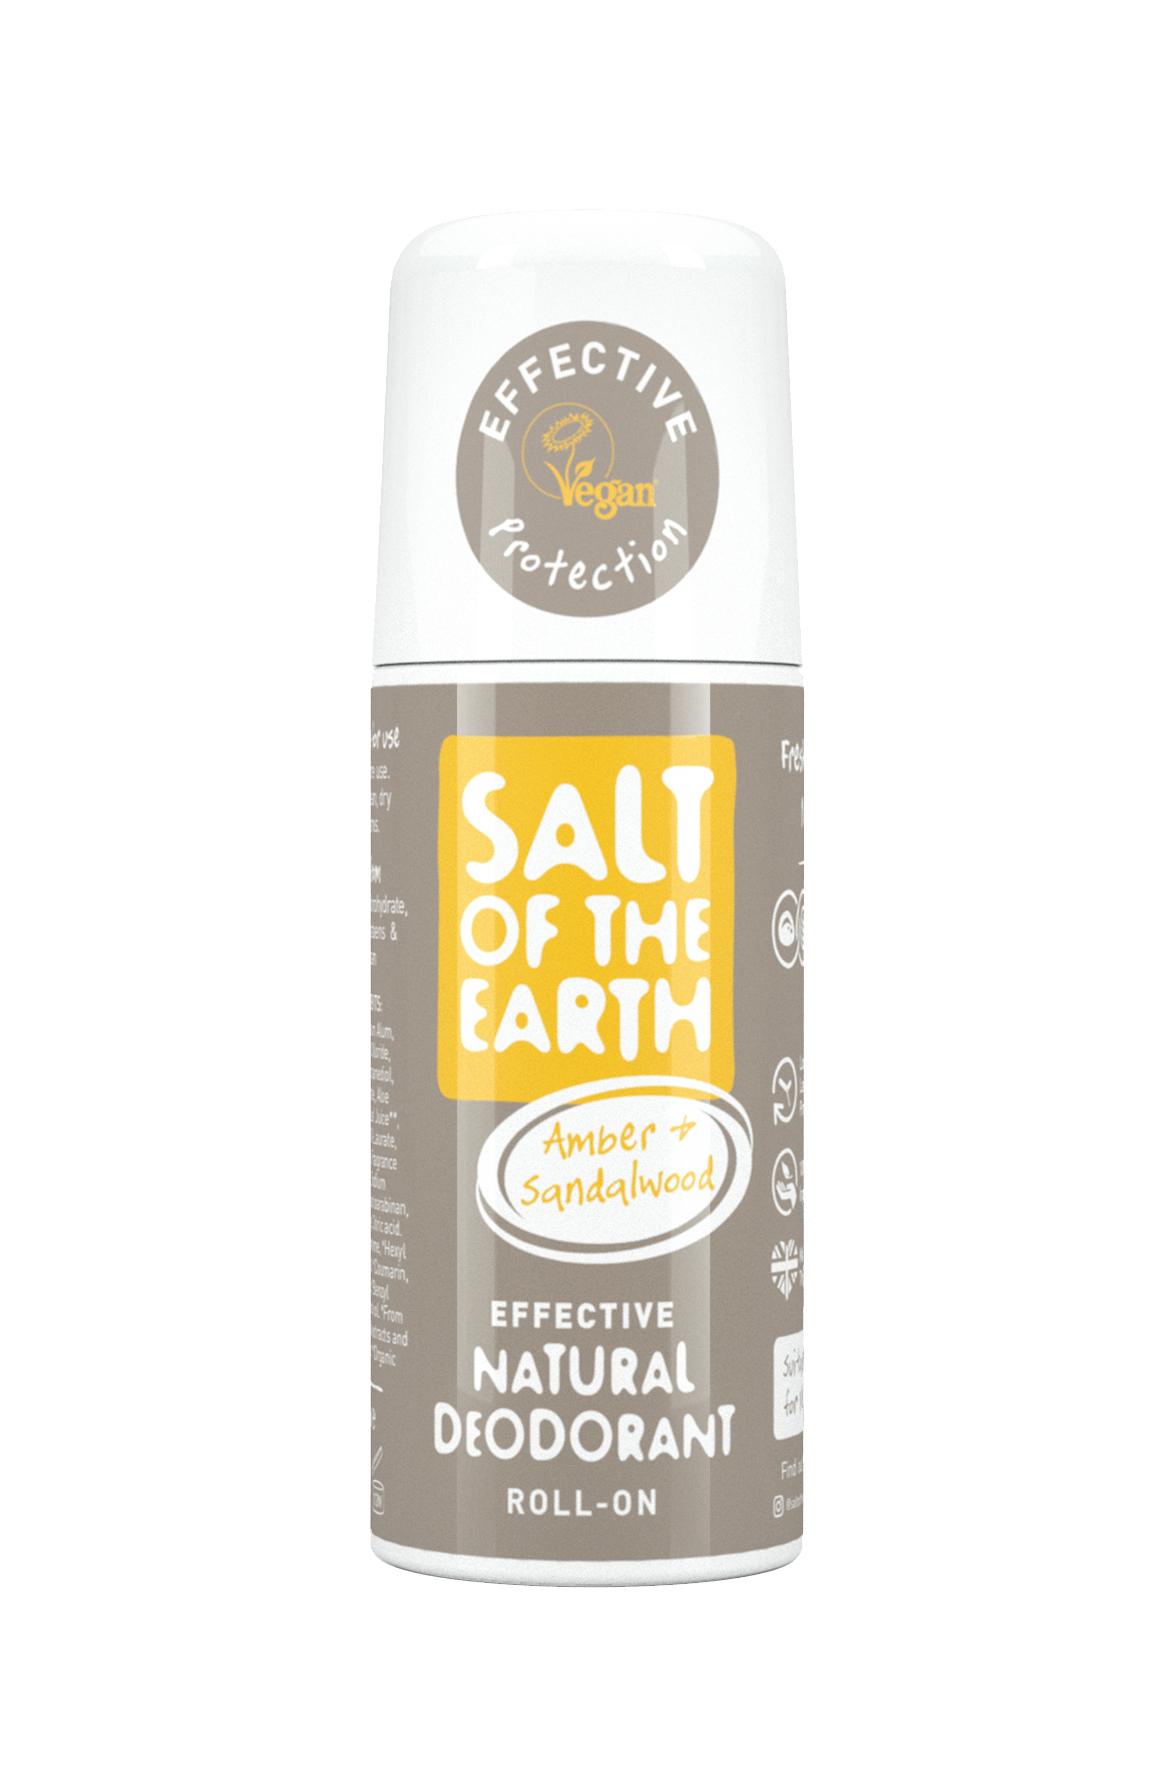 Amber & Sandalwood Natural Deodorant Roll-On 75ml